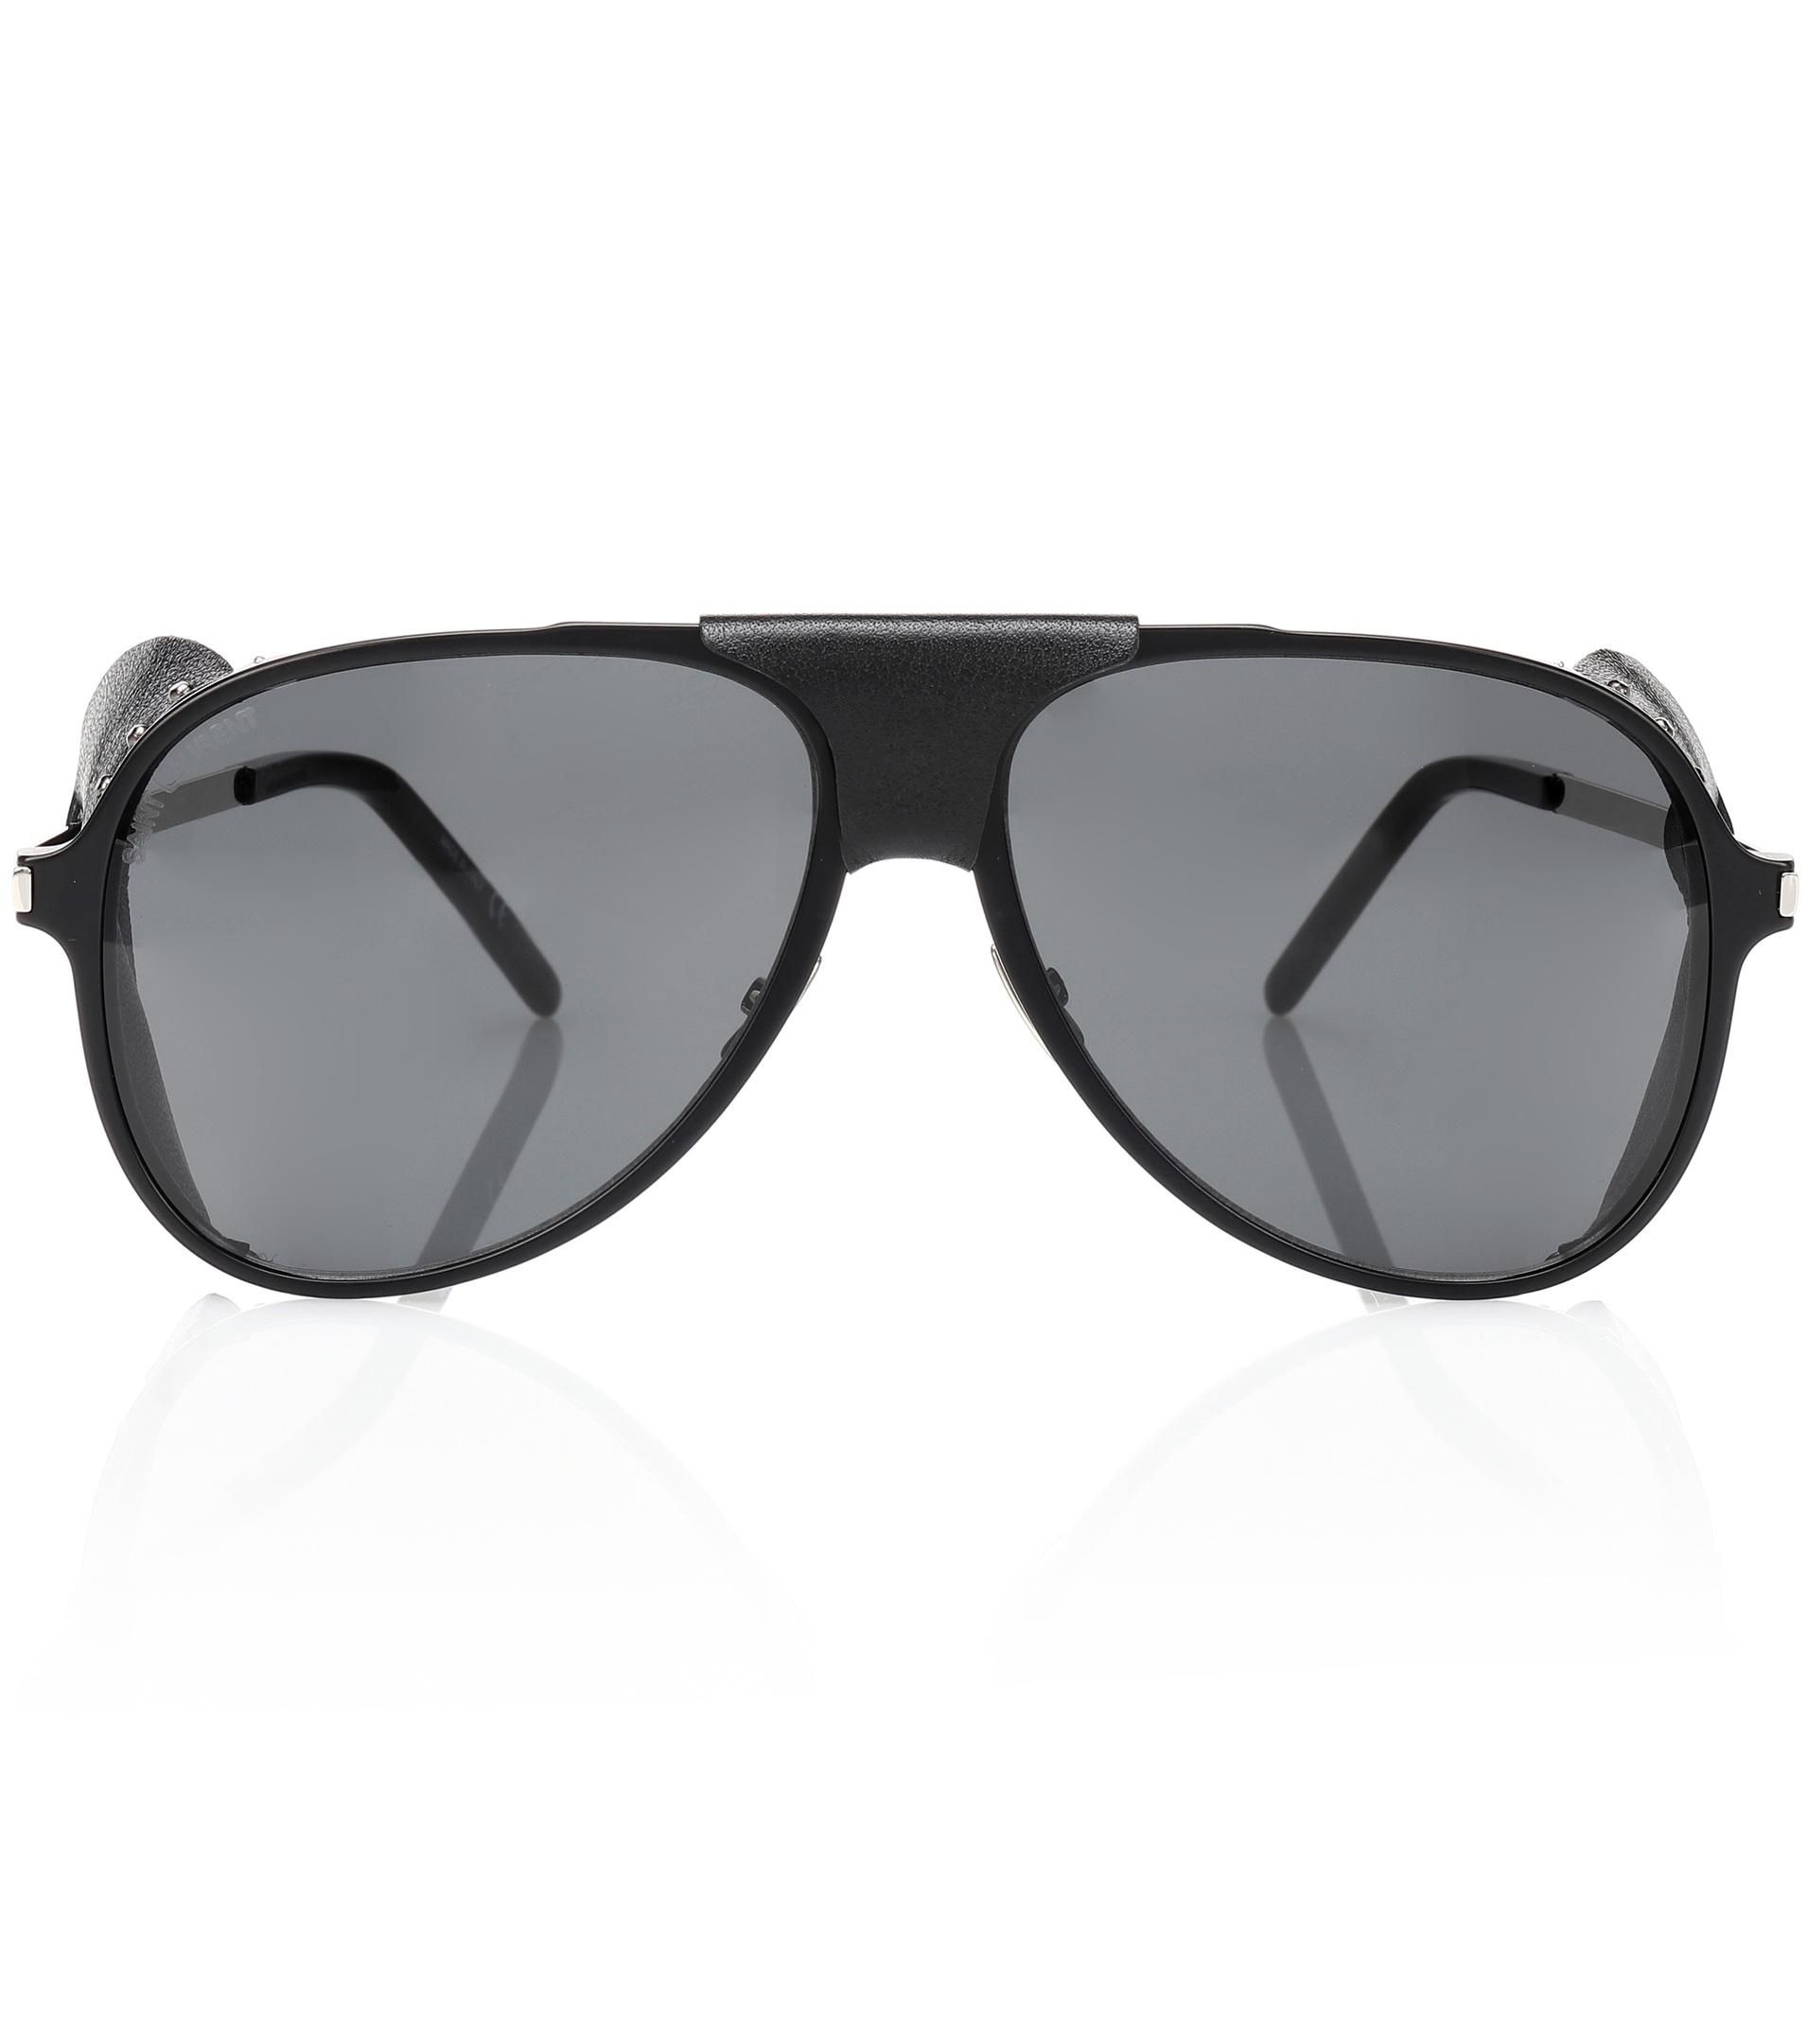 e9fa71a87d530 Saint Laurent Classic Aviator Sunglasses